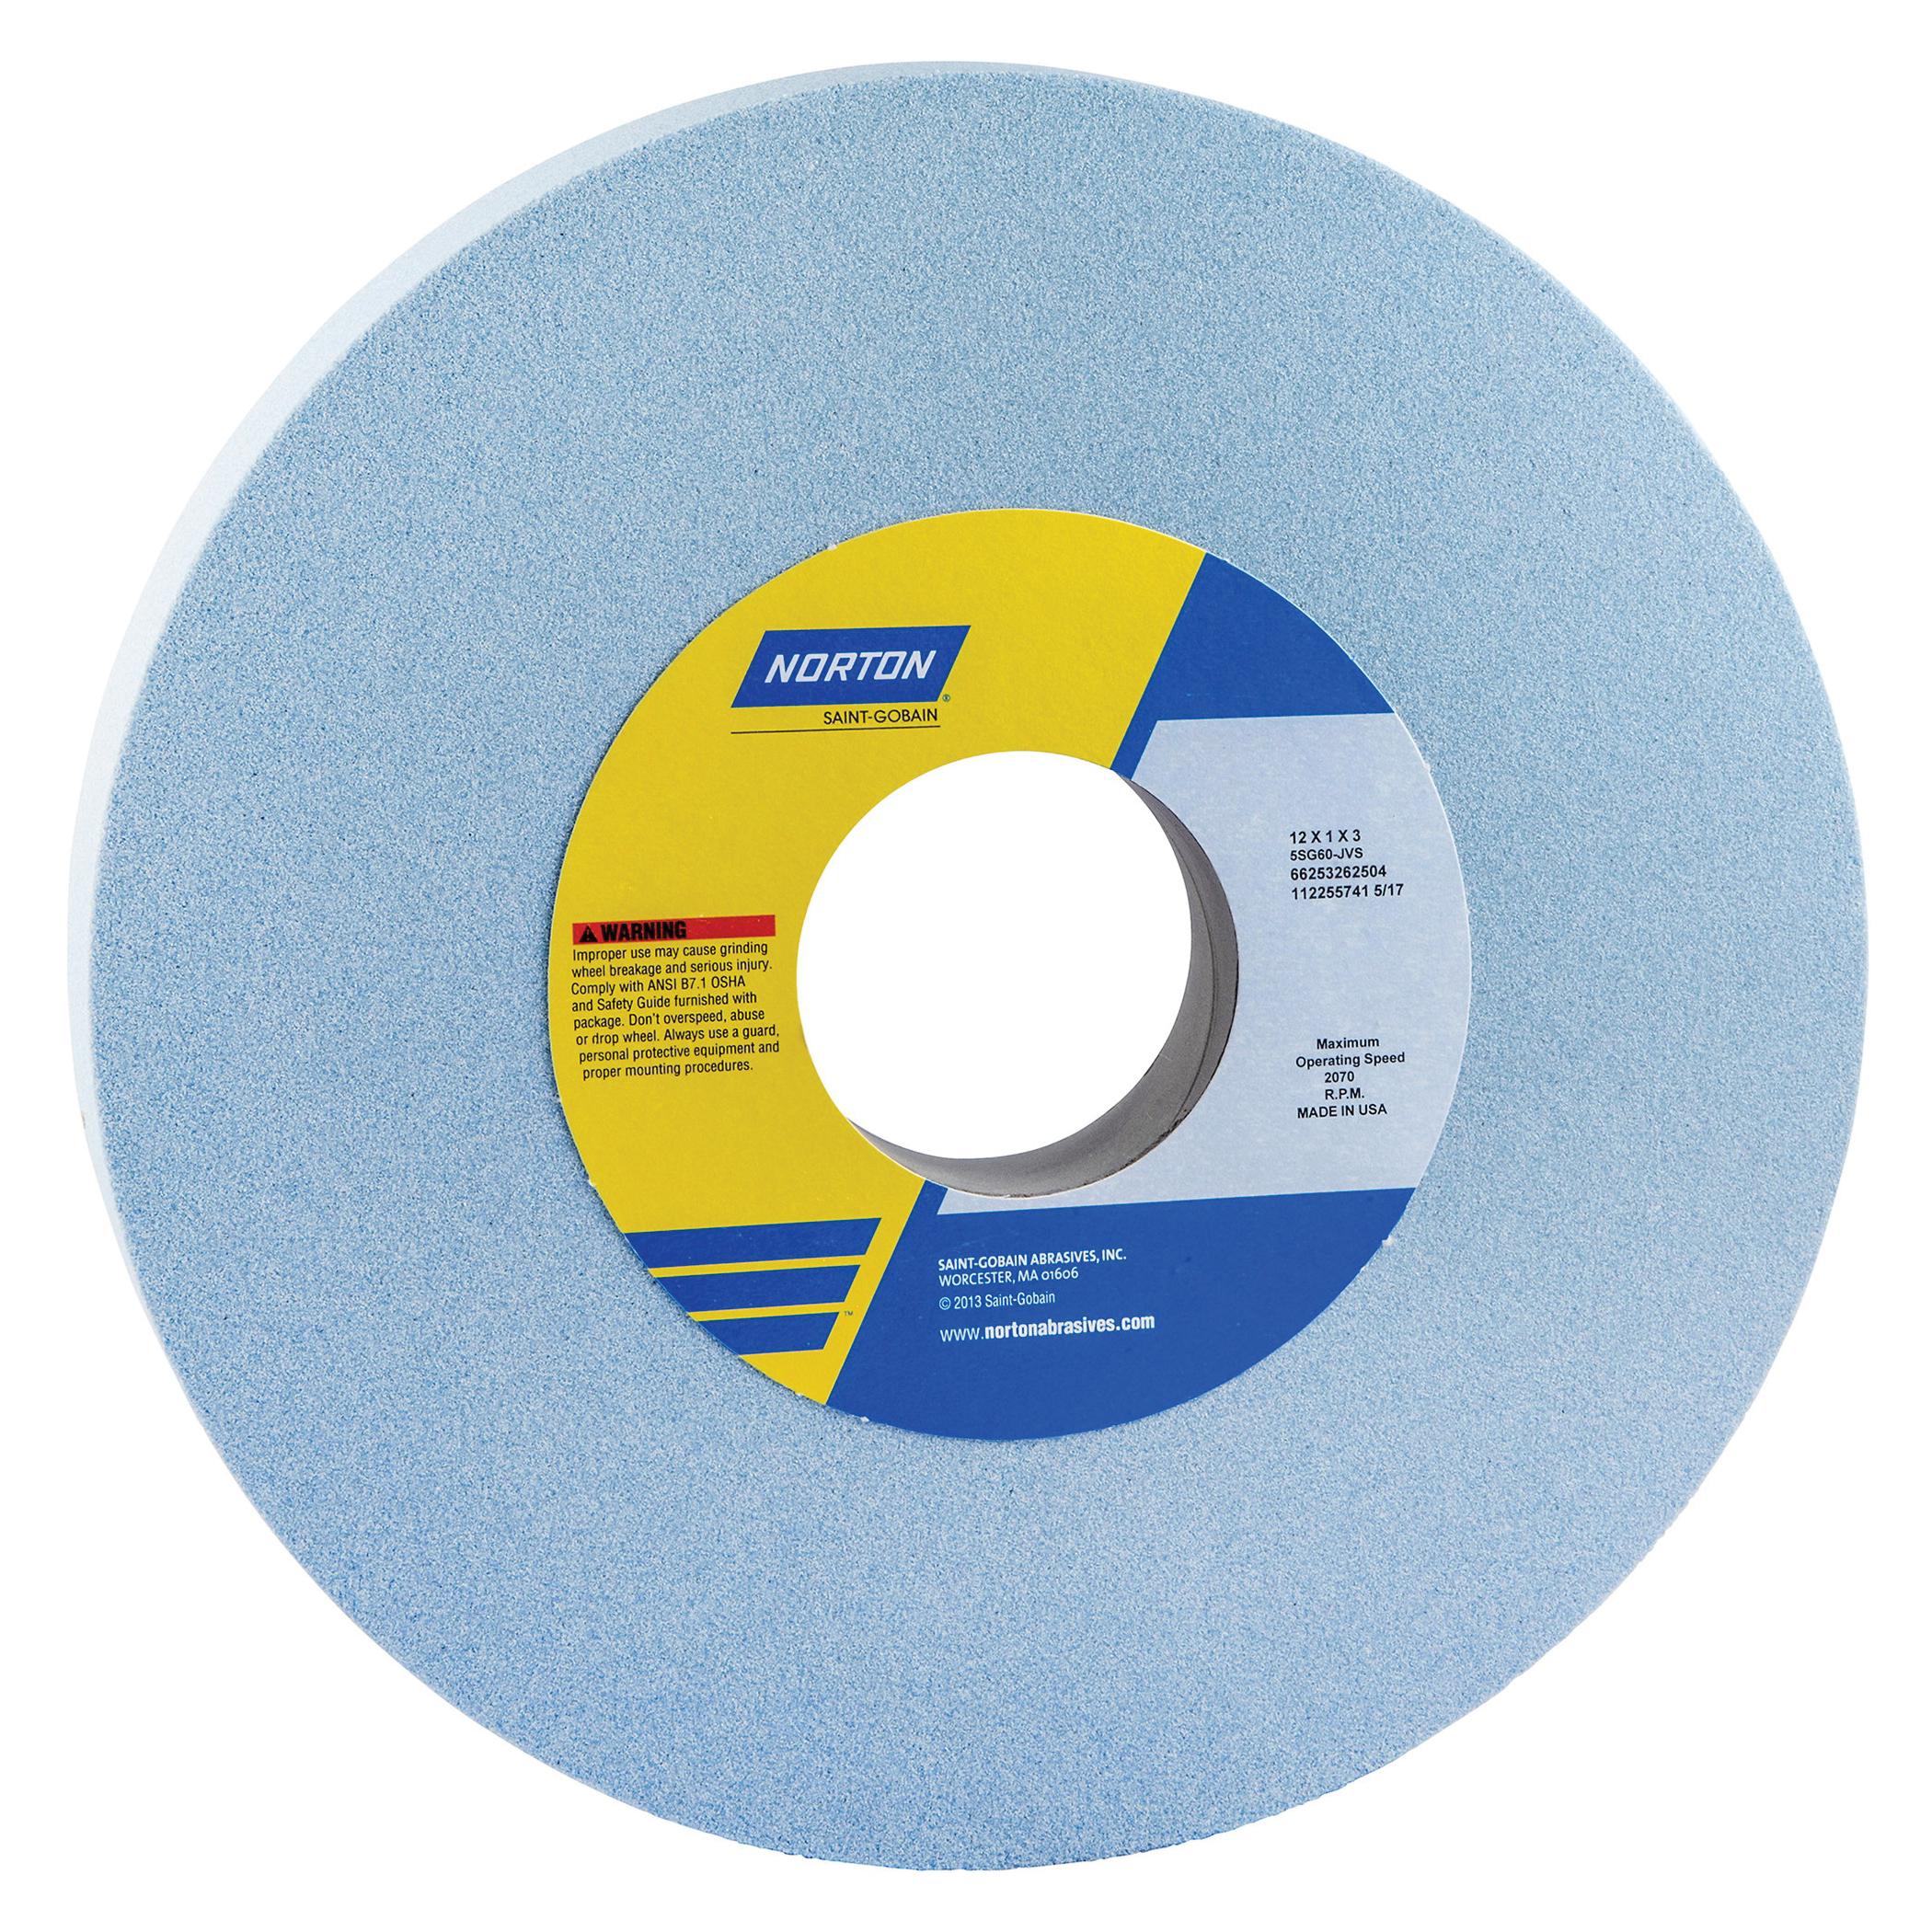 Norton® 66253262504 5SG Straight Toolroom Wheel, 12 in Dia x 1 in THK, 3 in Center Hole, 60 Grit, Ceramic Alumina/Friable Aluminum Oxide Abrasive